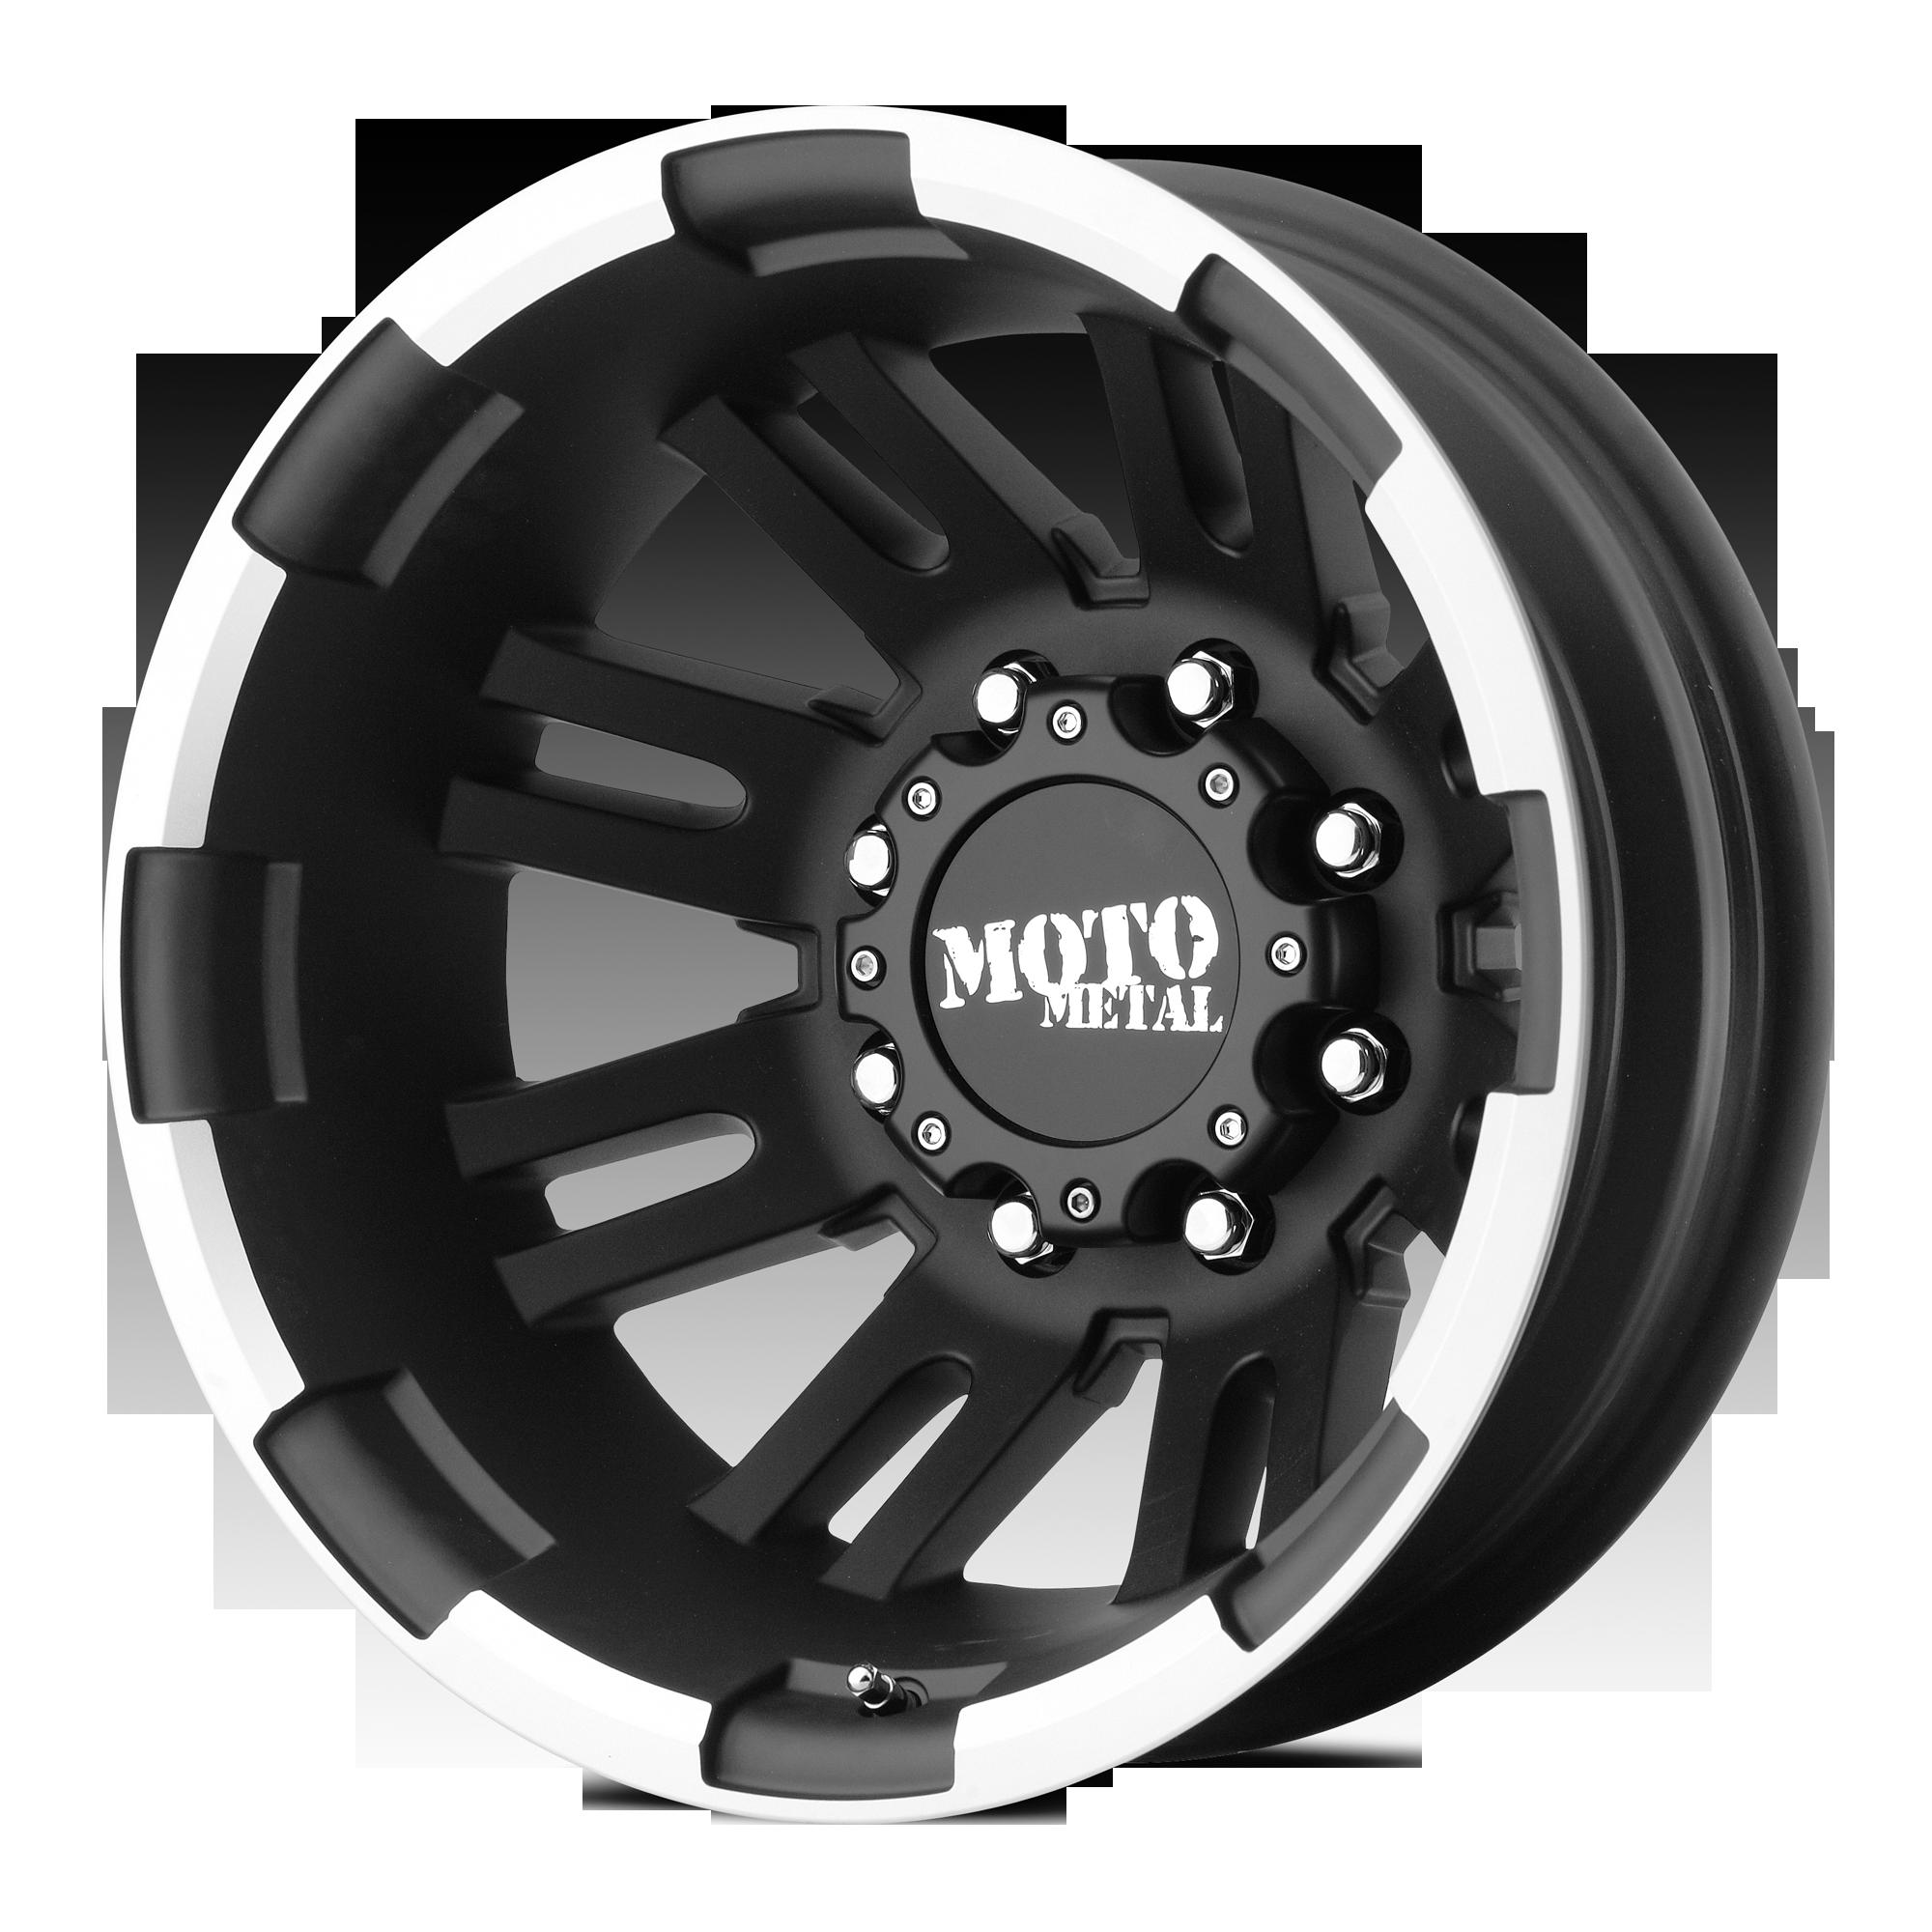 MOTO METAL MO963 hliníkové disky 6x17 8x165,1 ET-134 Matte Black Machined - Rear